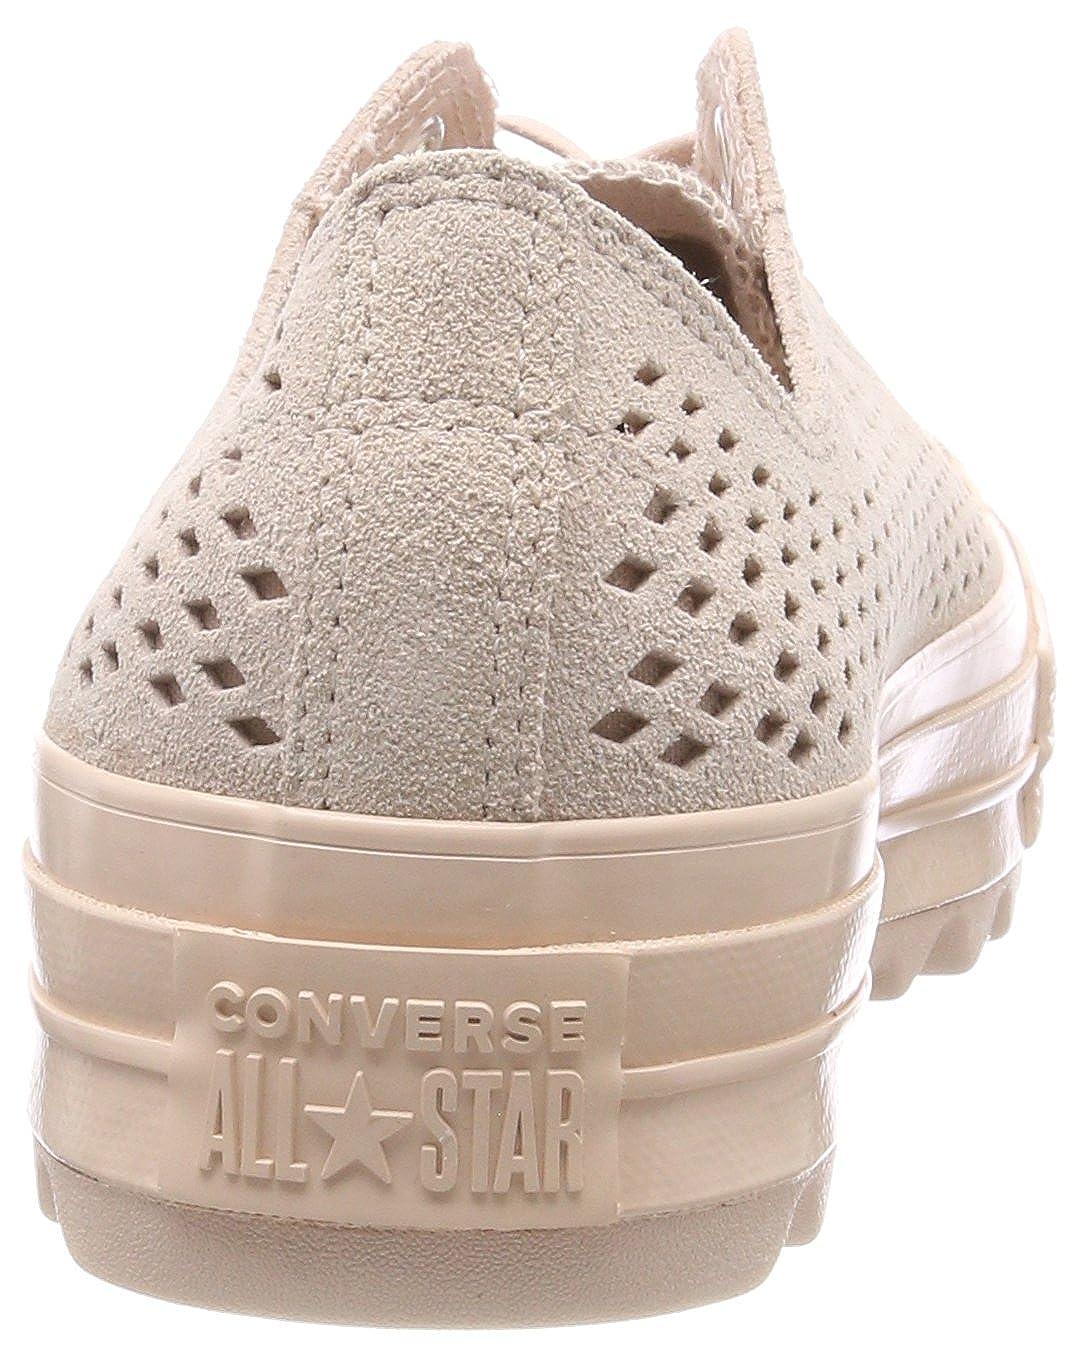 Converse Ctas Lift Ripple Ox Ox Ox Particle Beige, scarpe da ginnastica Donna dccc3c